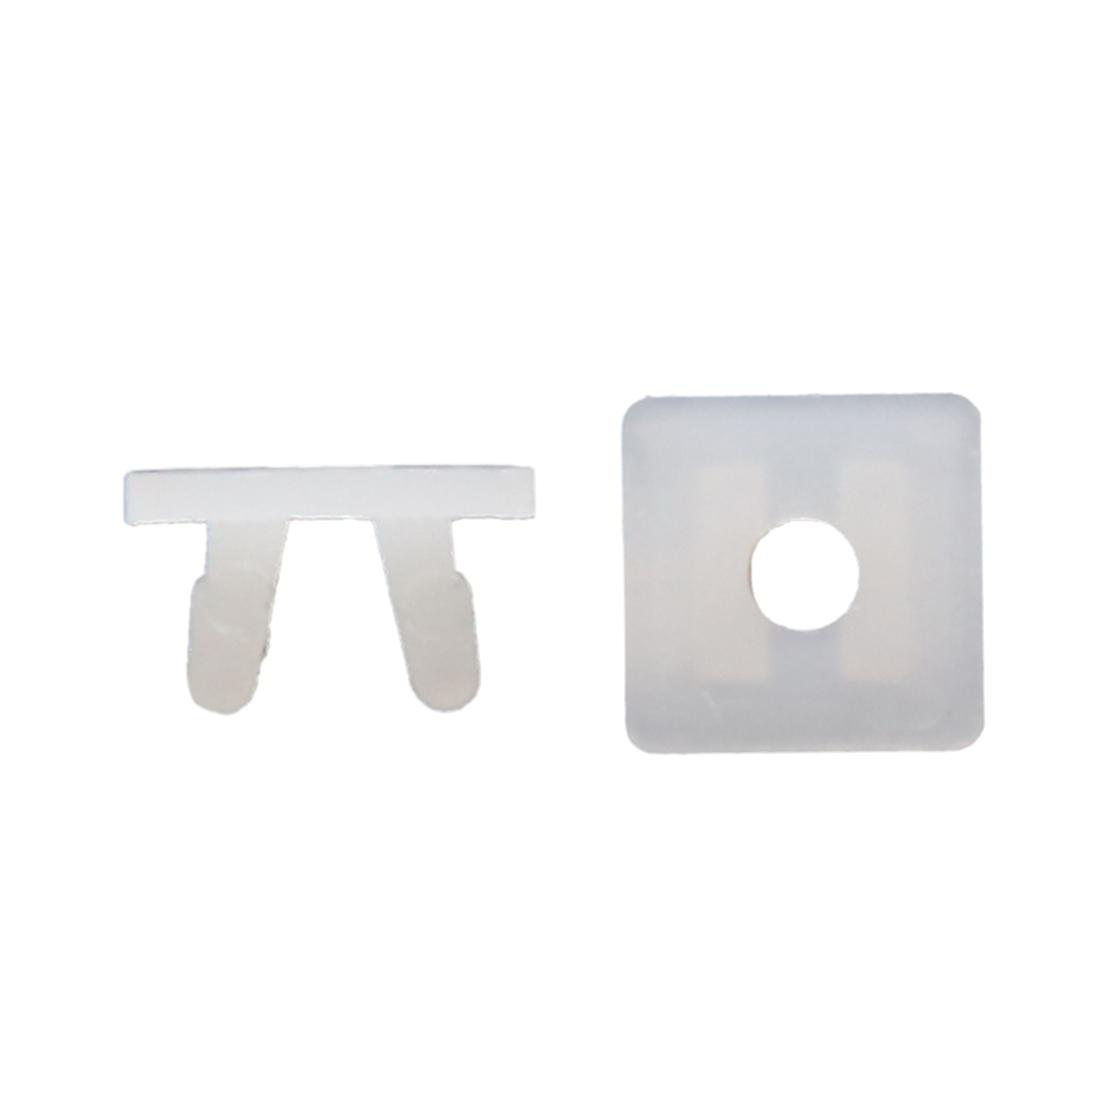 20pcs 9 x 8mm Hole Plastic Rivet Mud Flaps Fender Push Clips White for Vehicle